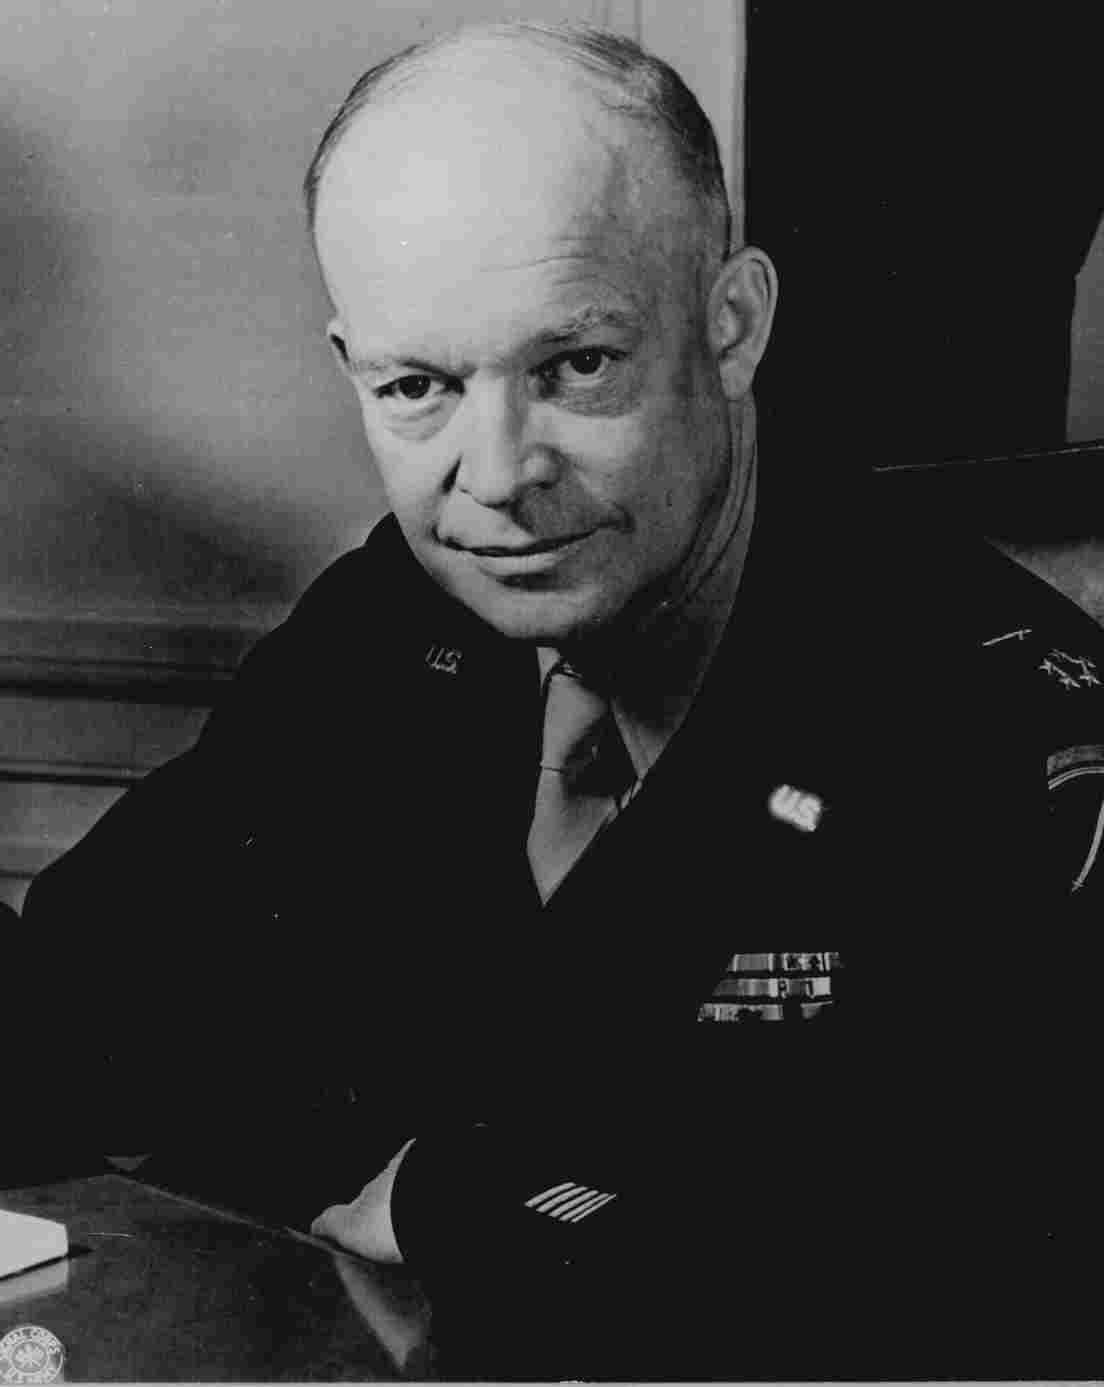 Dwight D. Eisenhower (Utopía Nazi)